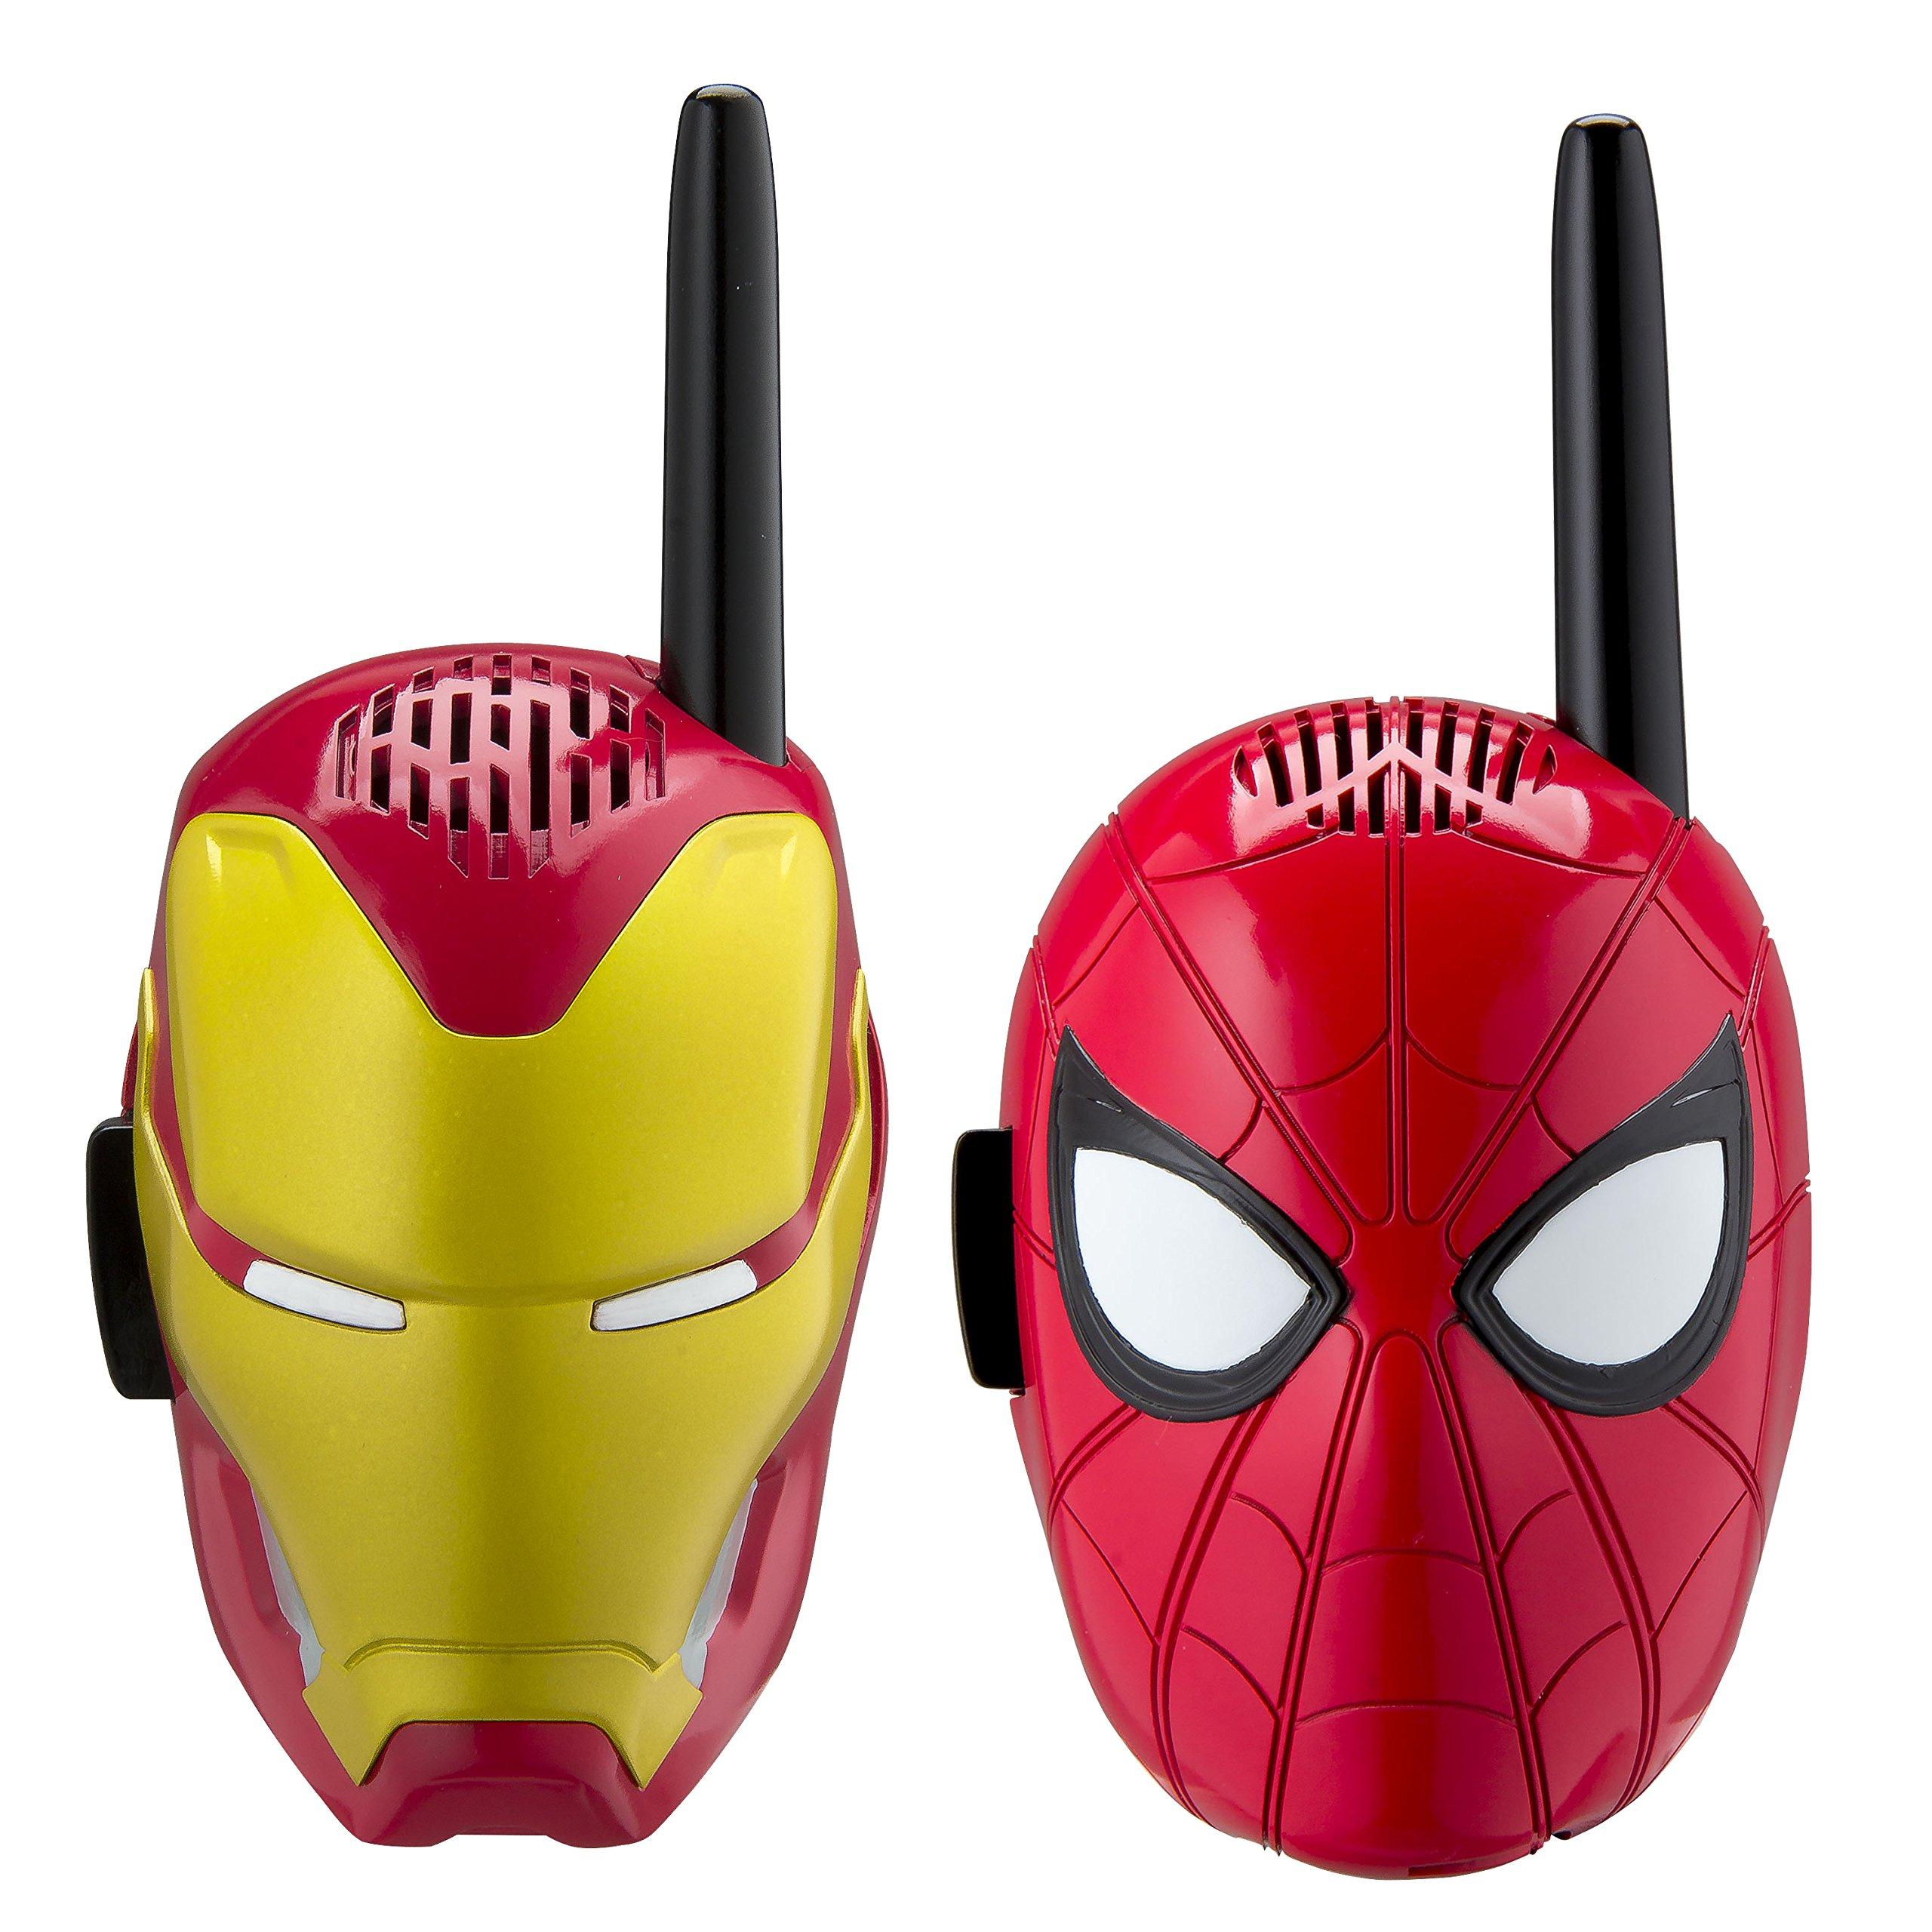 Avengers Infinity War Walkie Talkies for Kids Static Free Extended Range Kid Friendly Easy to Use 2 Way Walkie Talkies